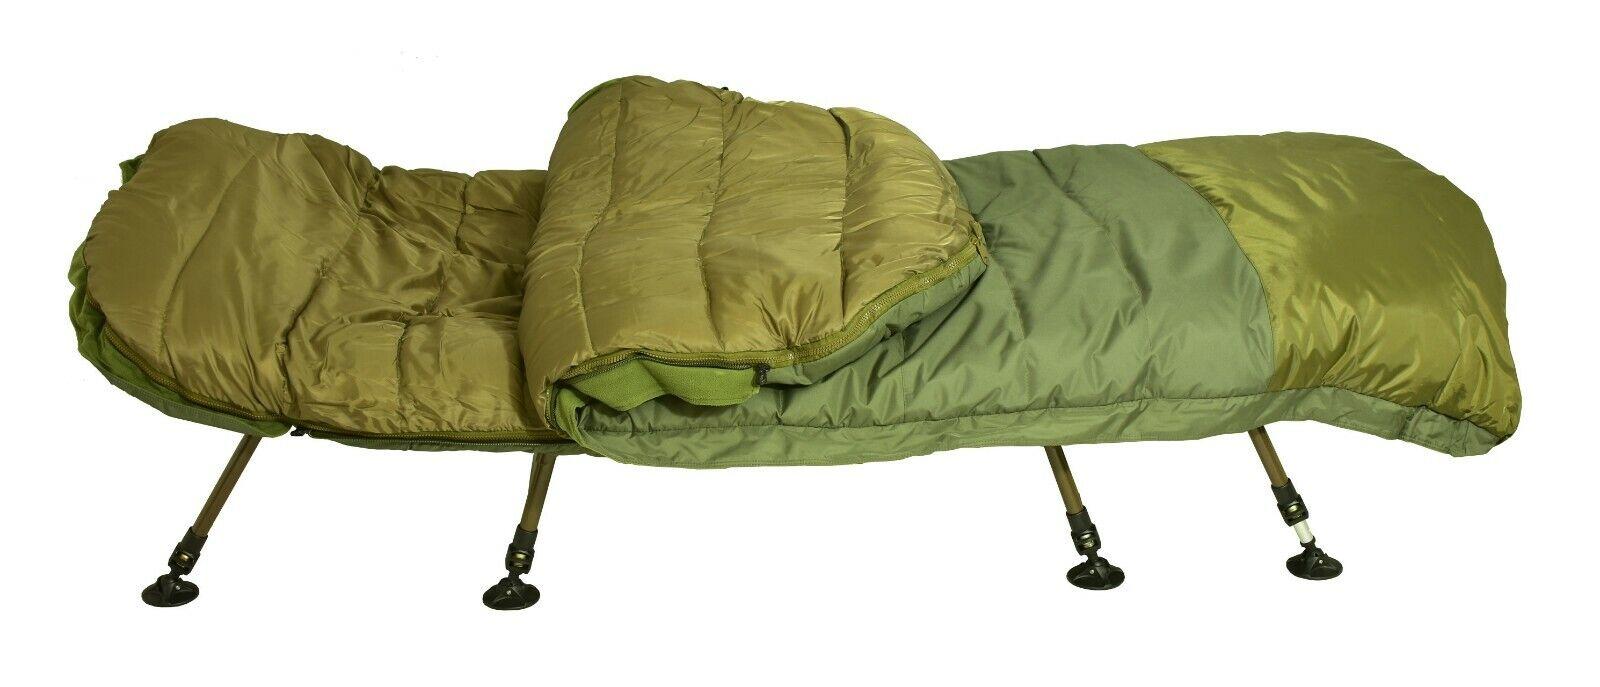 Carpon Saco de Dormir Tundra Combi 215cm X 105Cm